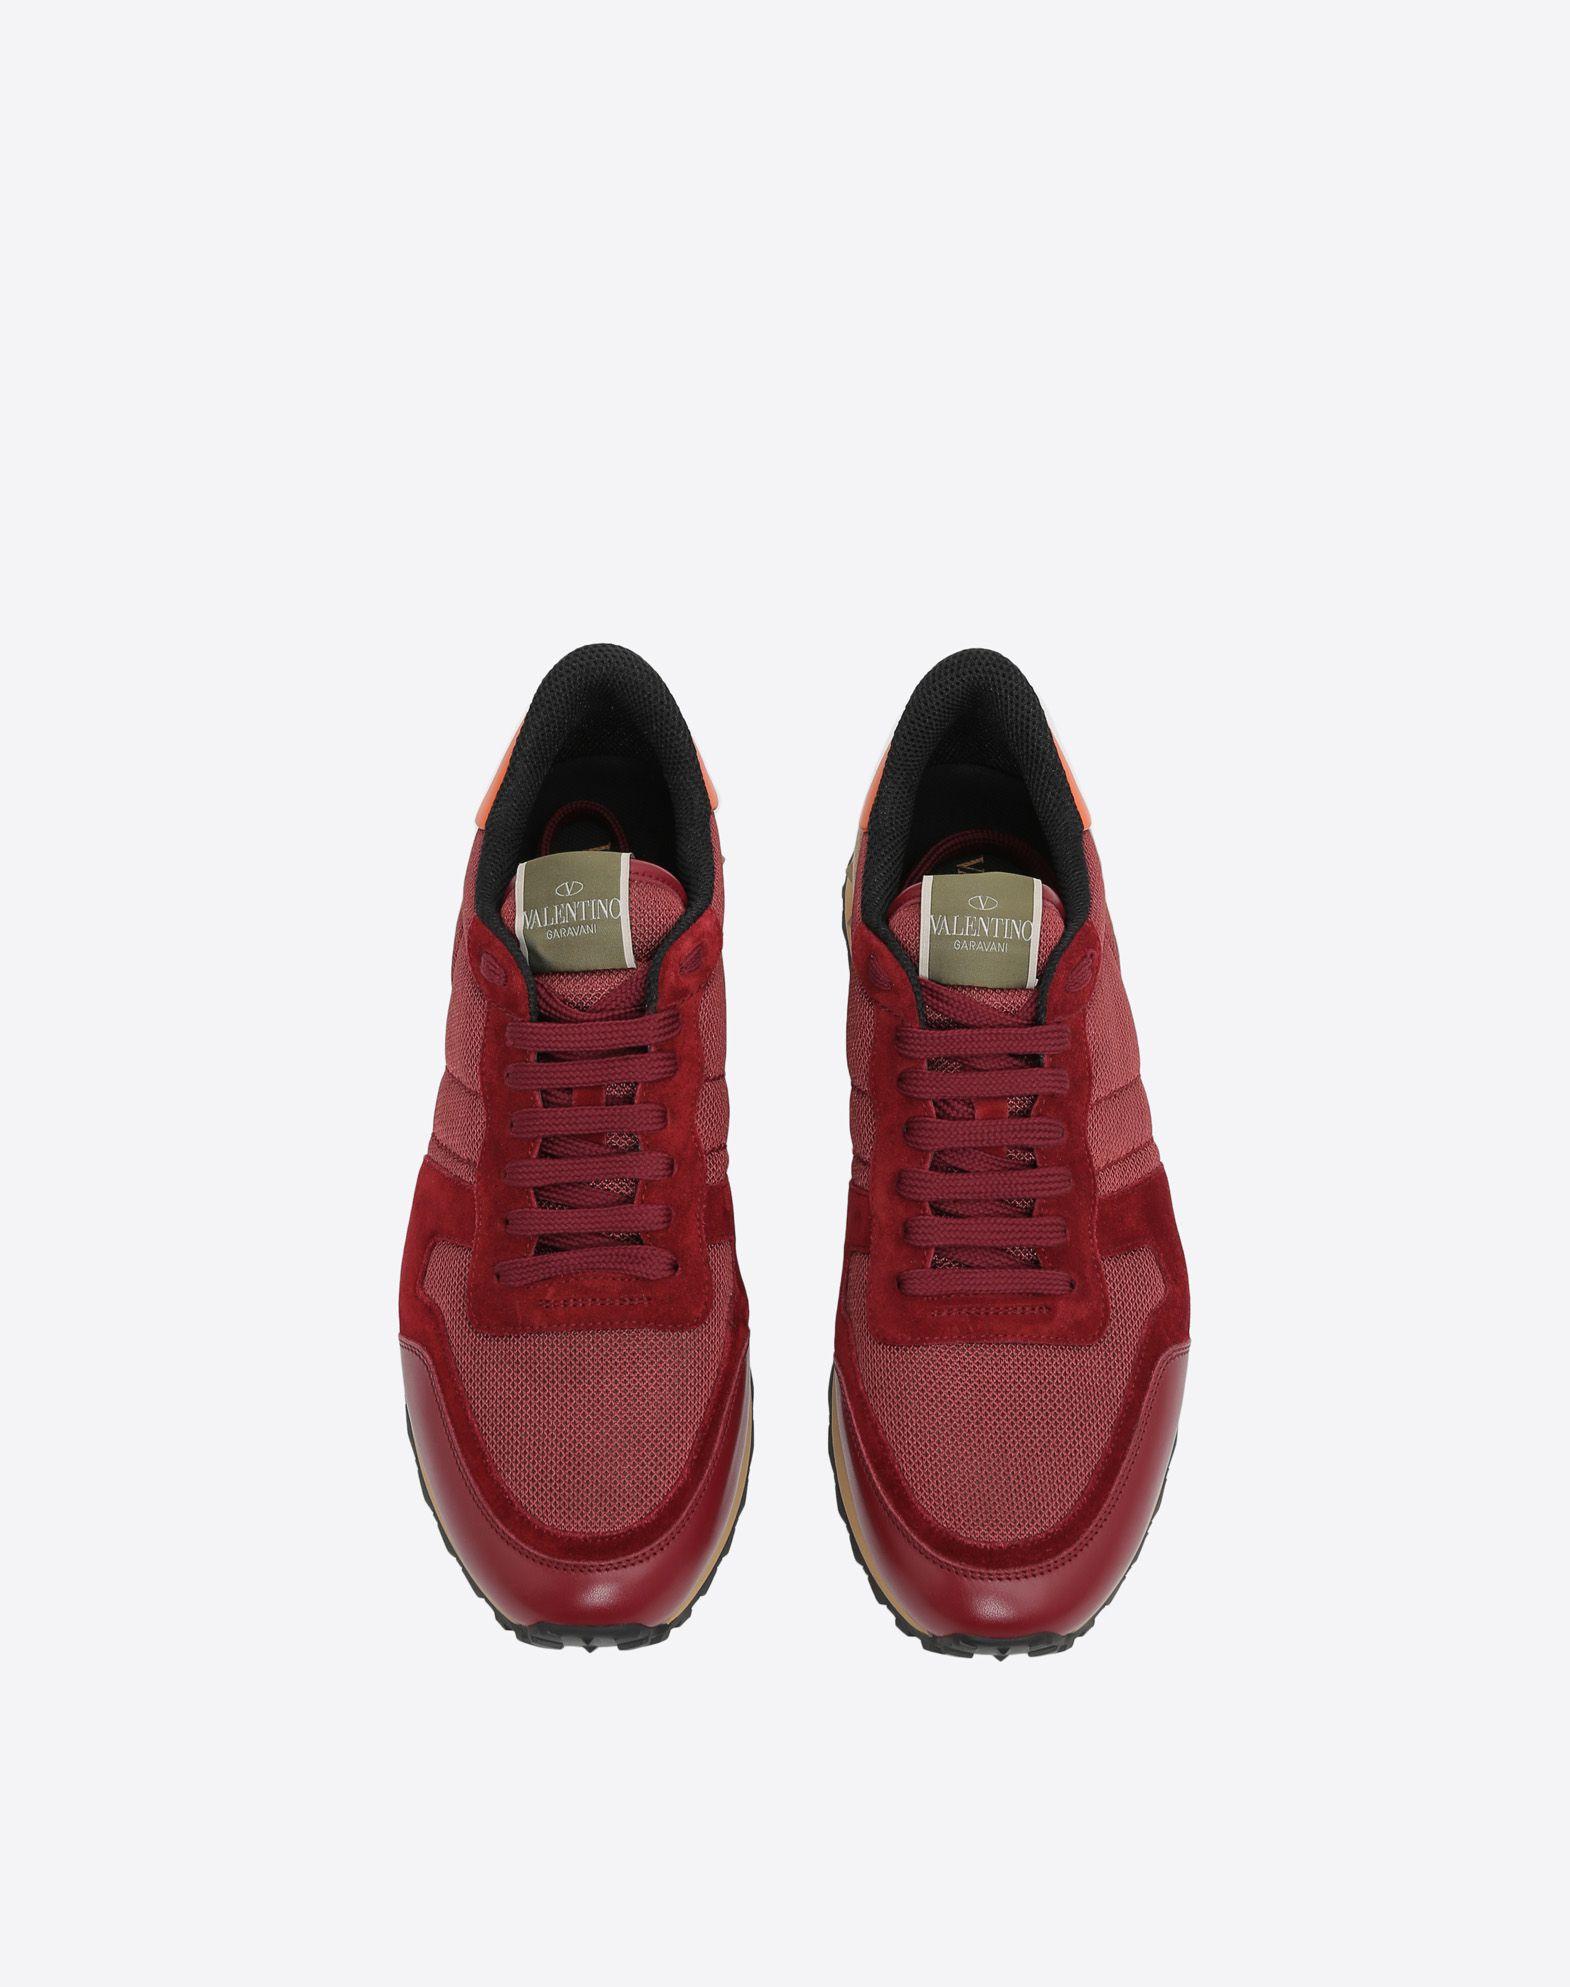 VALENTINO GARAVANI UOMO Rockrunner Sneaker LOW-TOP SNEAKERS U e